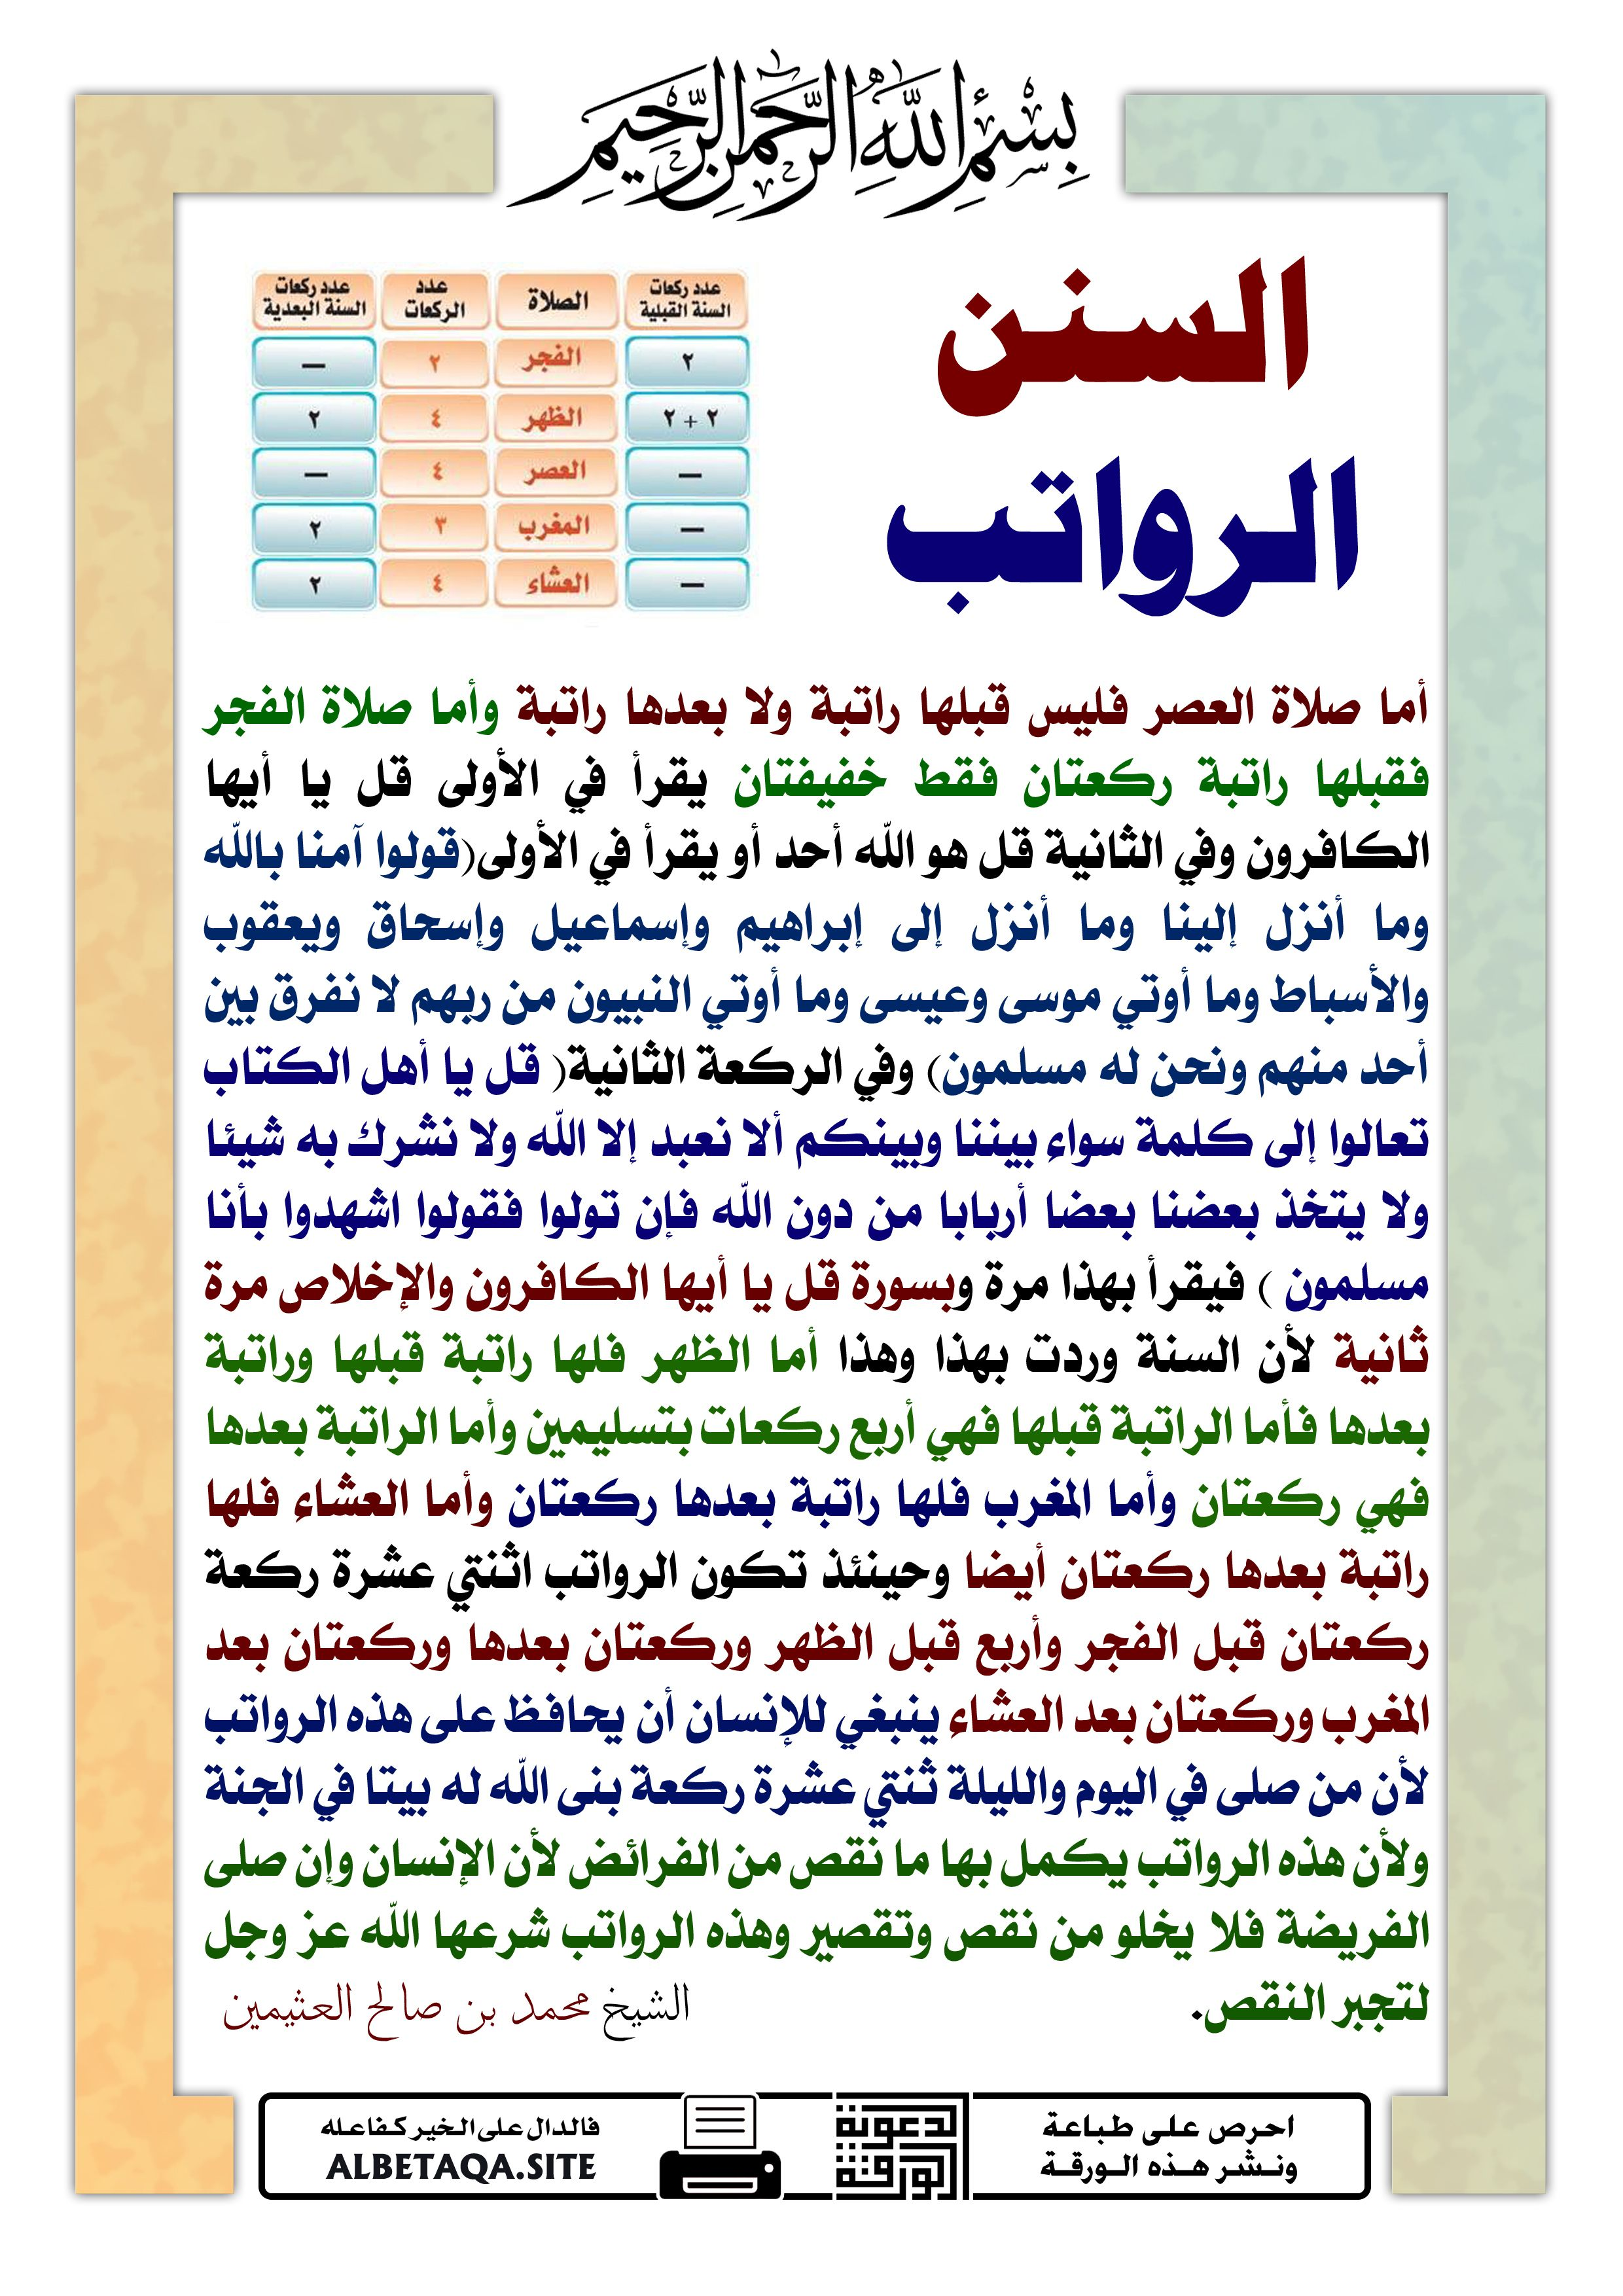 Pin By Fouad Osman On الهم صل علي سيدنا محمد الفاتح الخاتم الناصر الهادي Islam Facts Islamic Quotes Islamic Quotes Quran